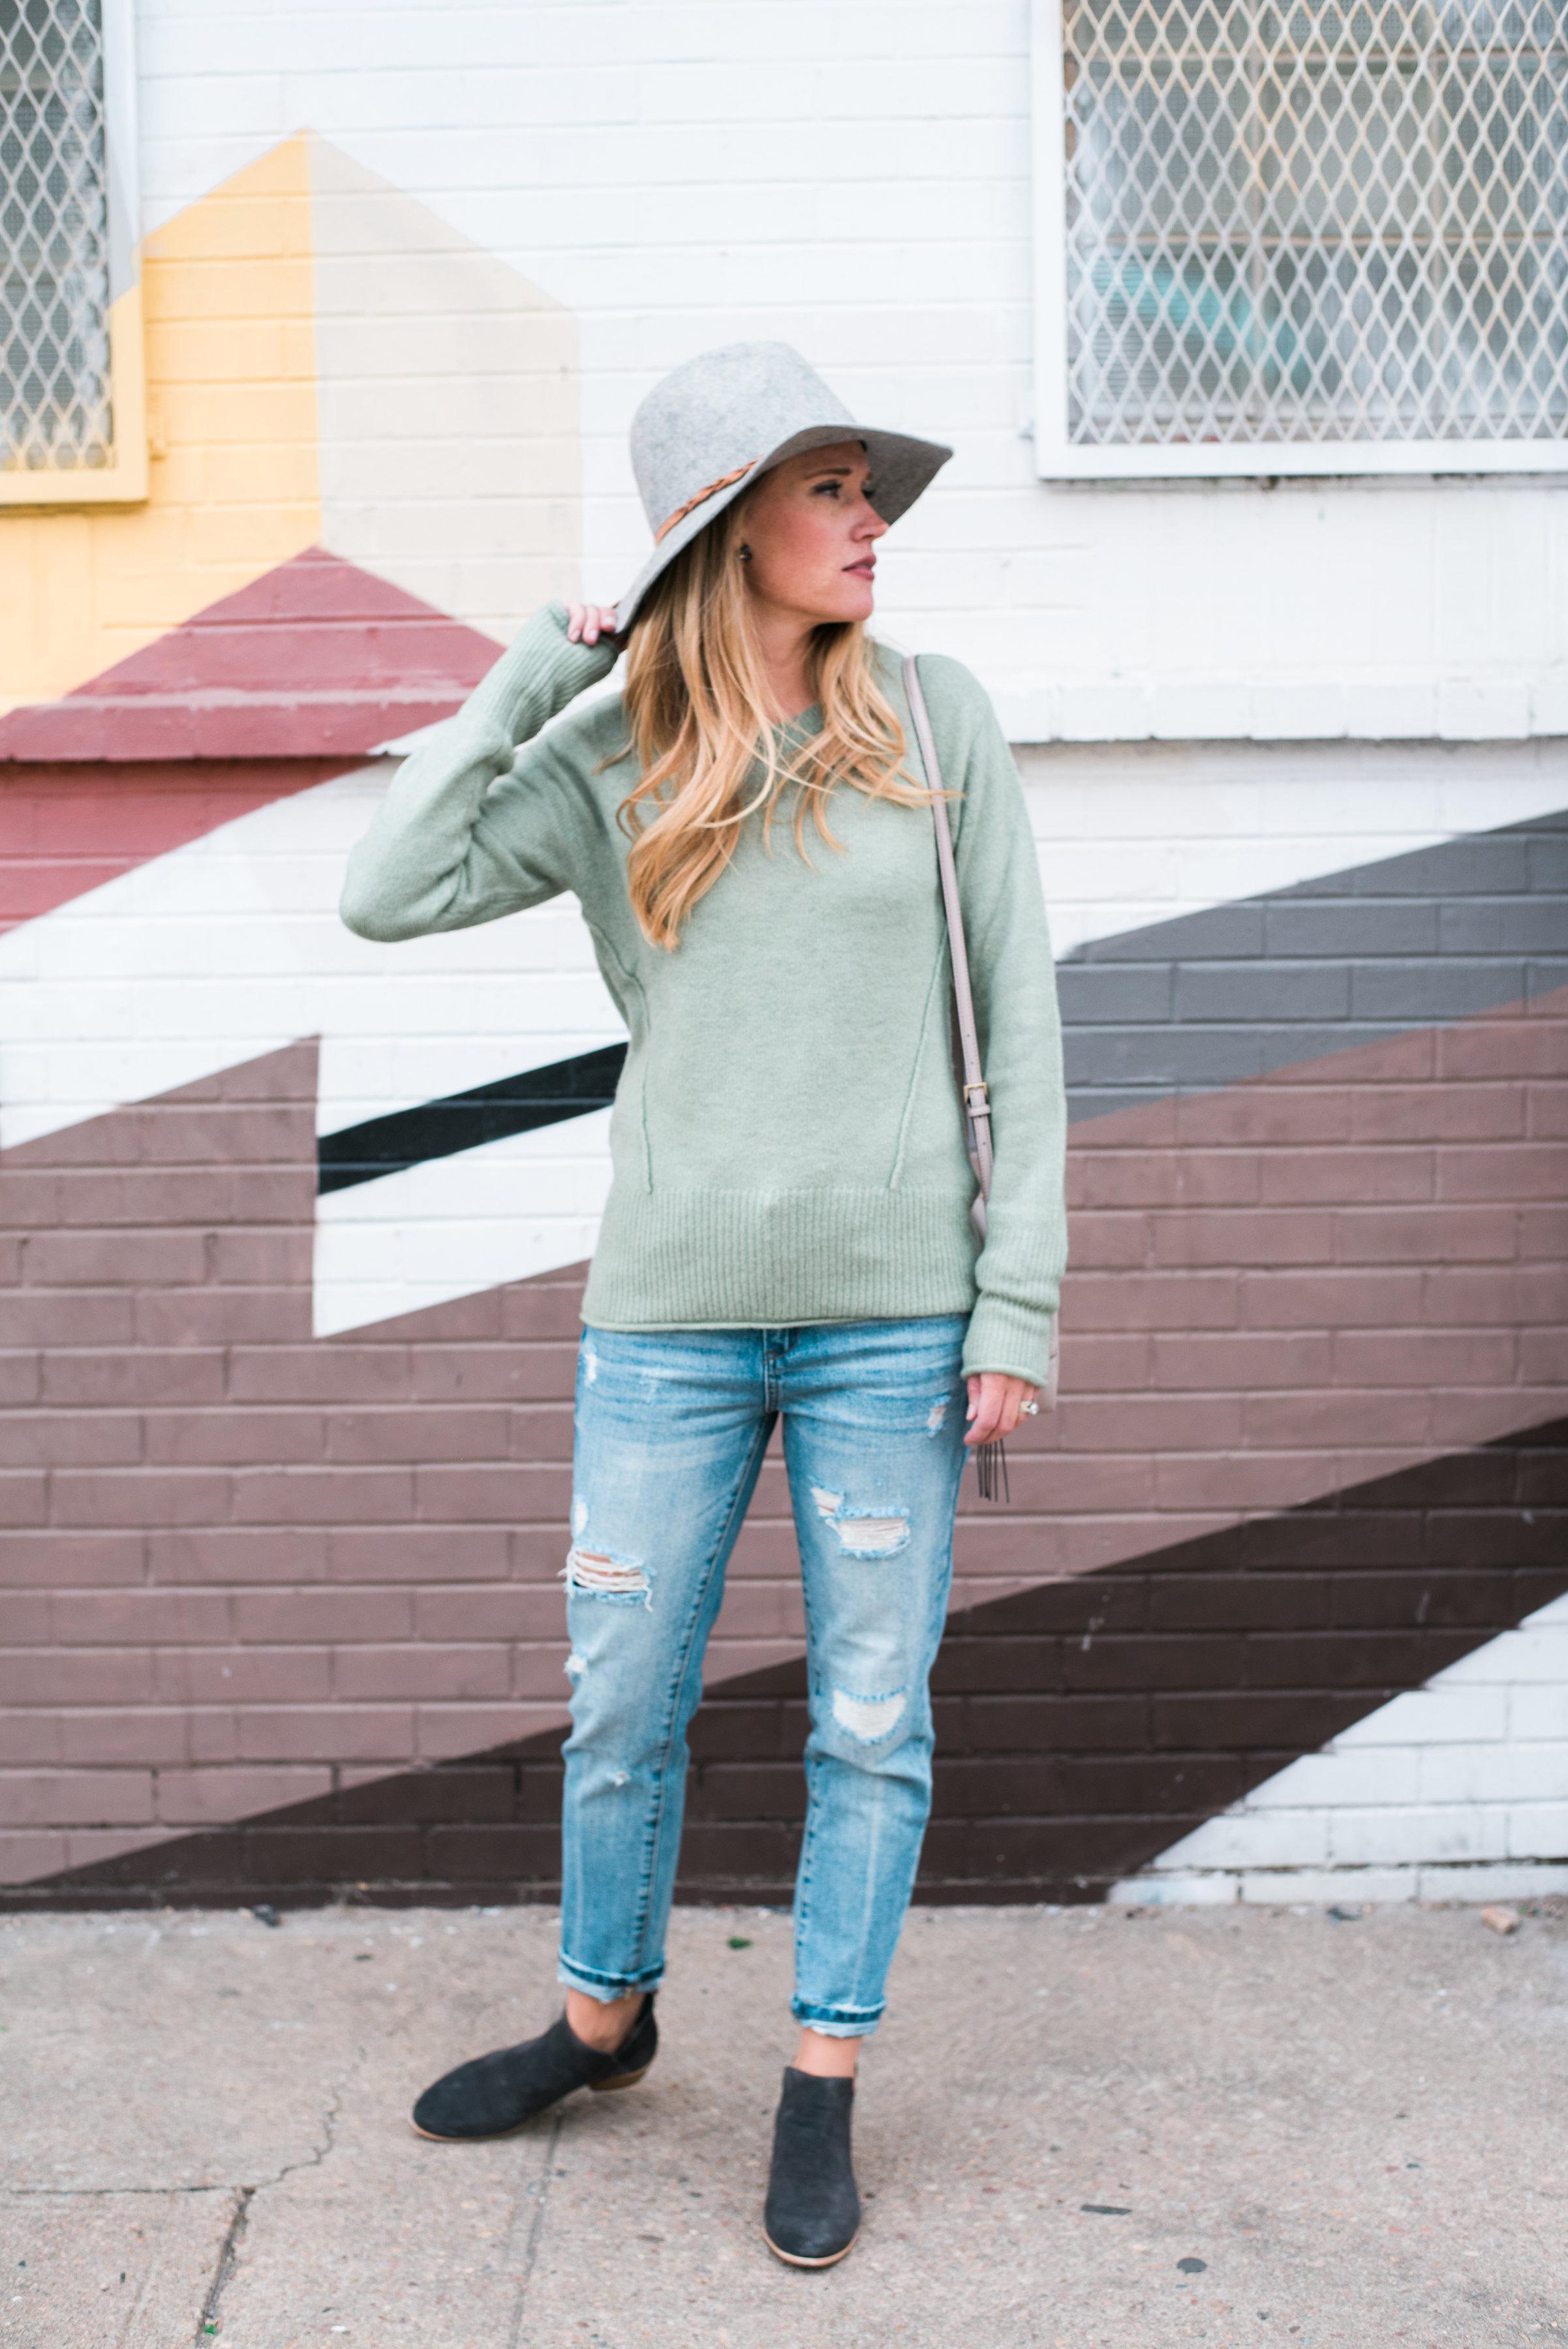 Distressed Denim + Casual Sweater